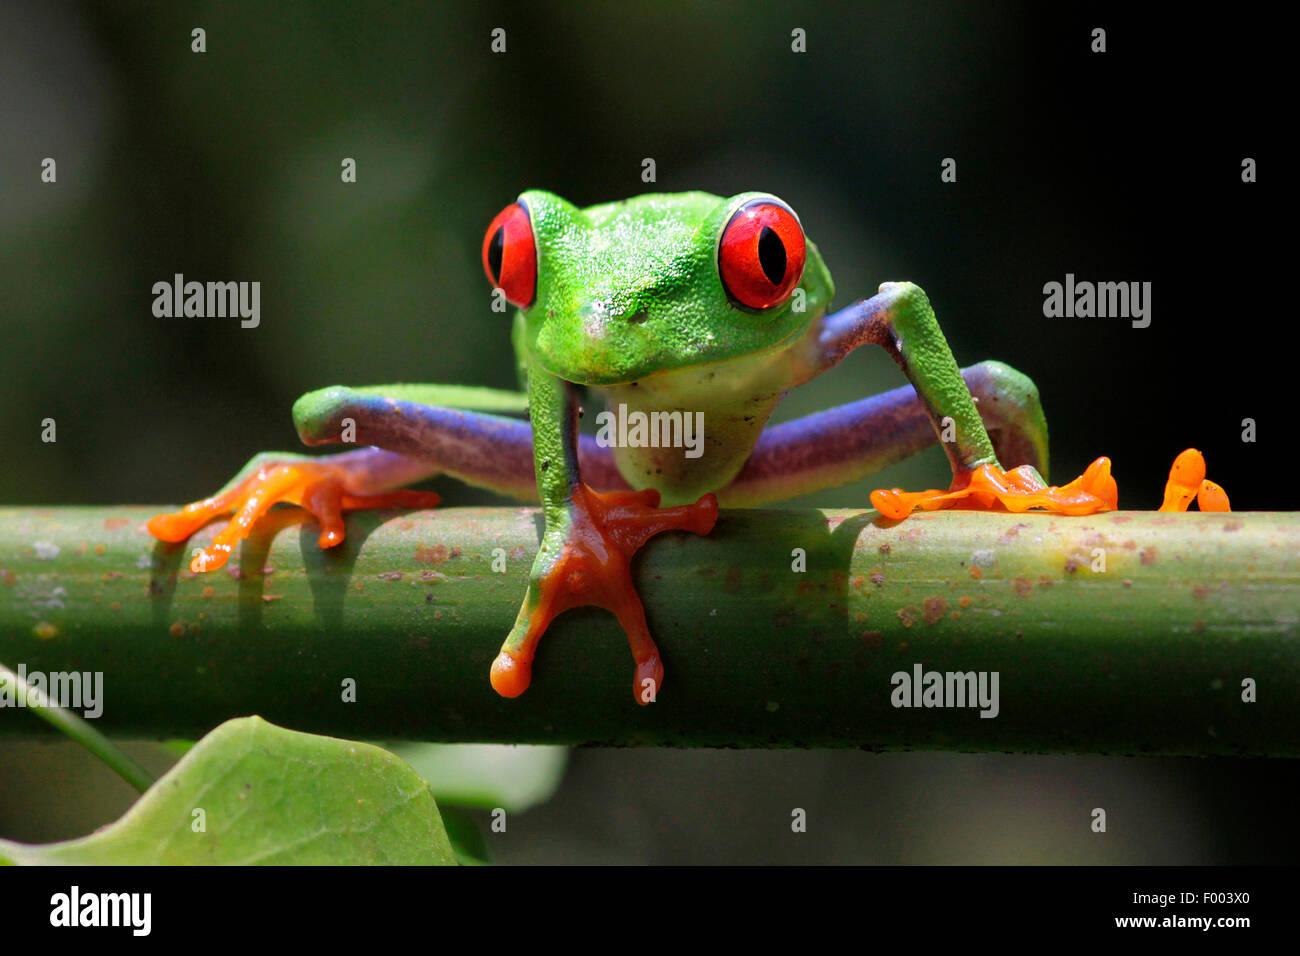 red-eyed treefrog, redeyed treefrog, redeye treefrog, red eye treefrog, red eyed frog (Agalychnis callidryas), on - Stock Image